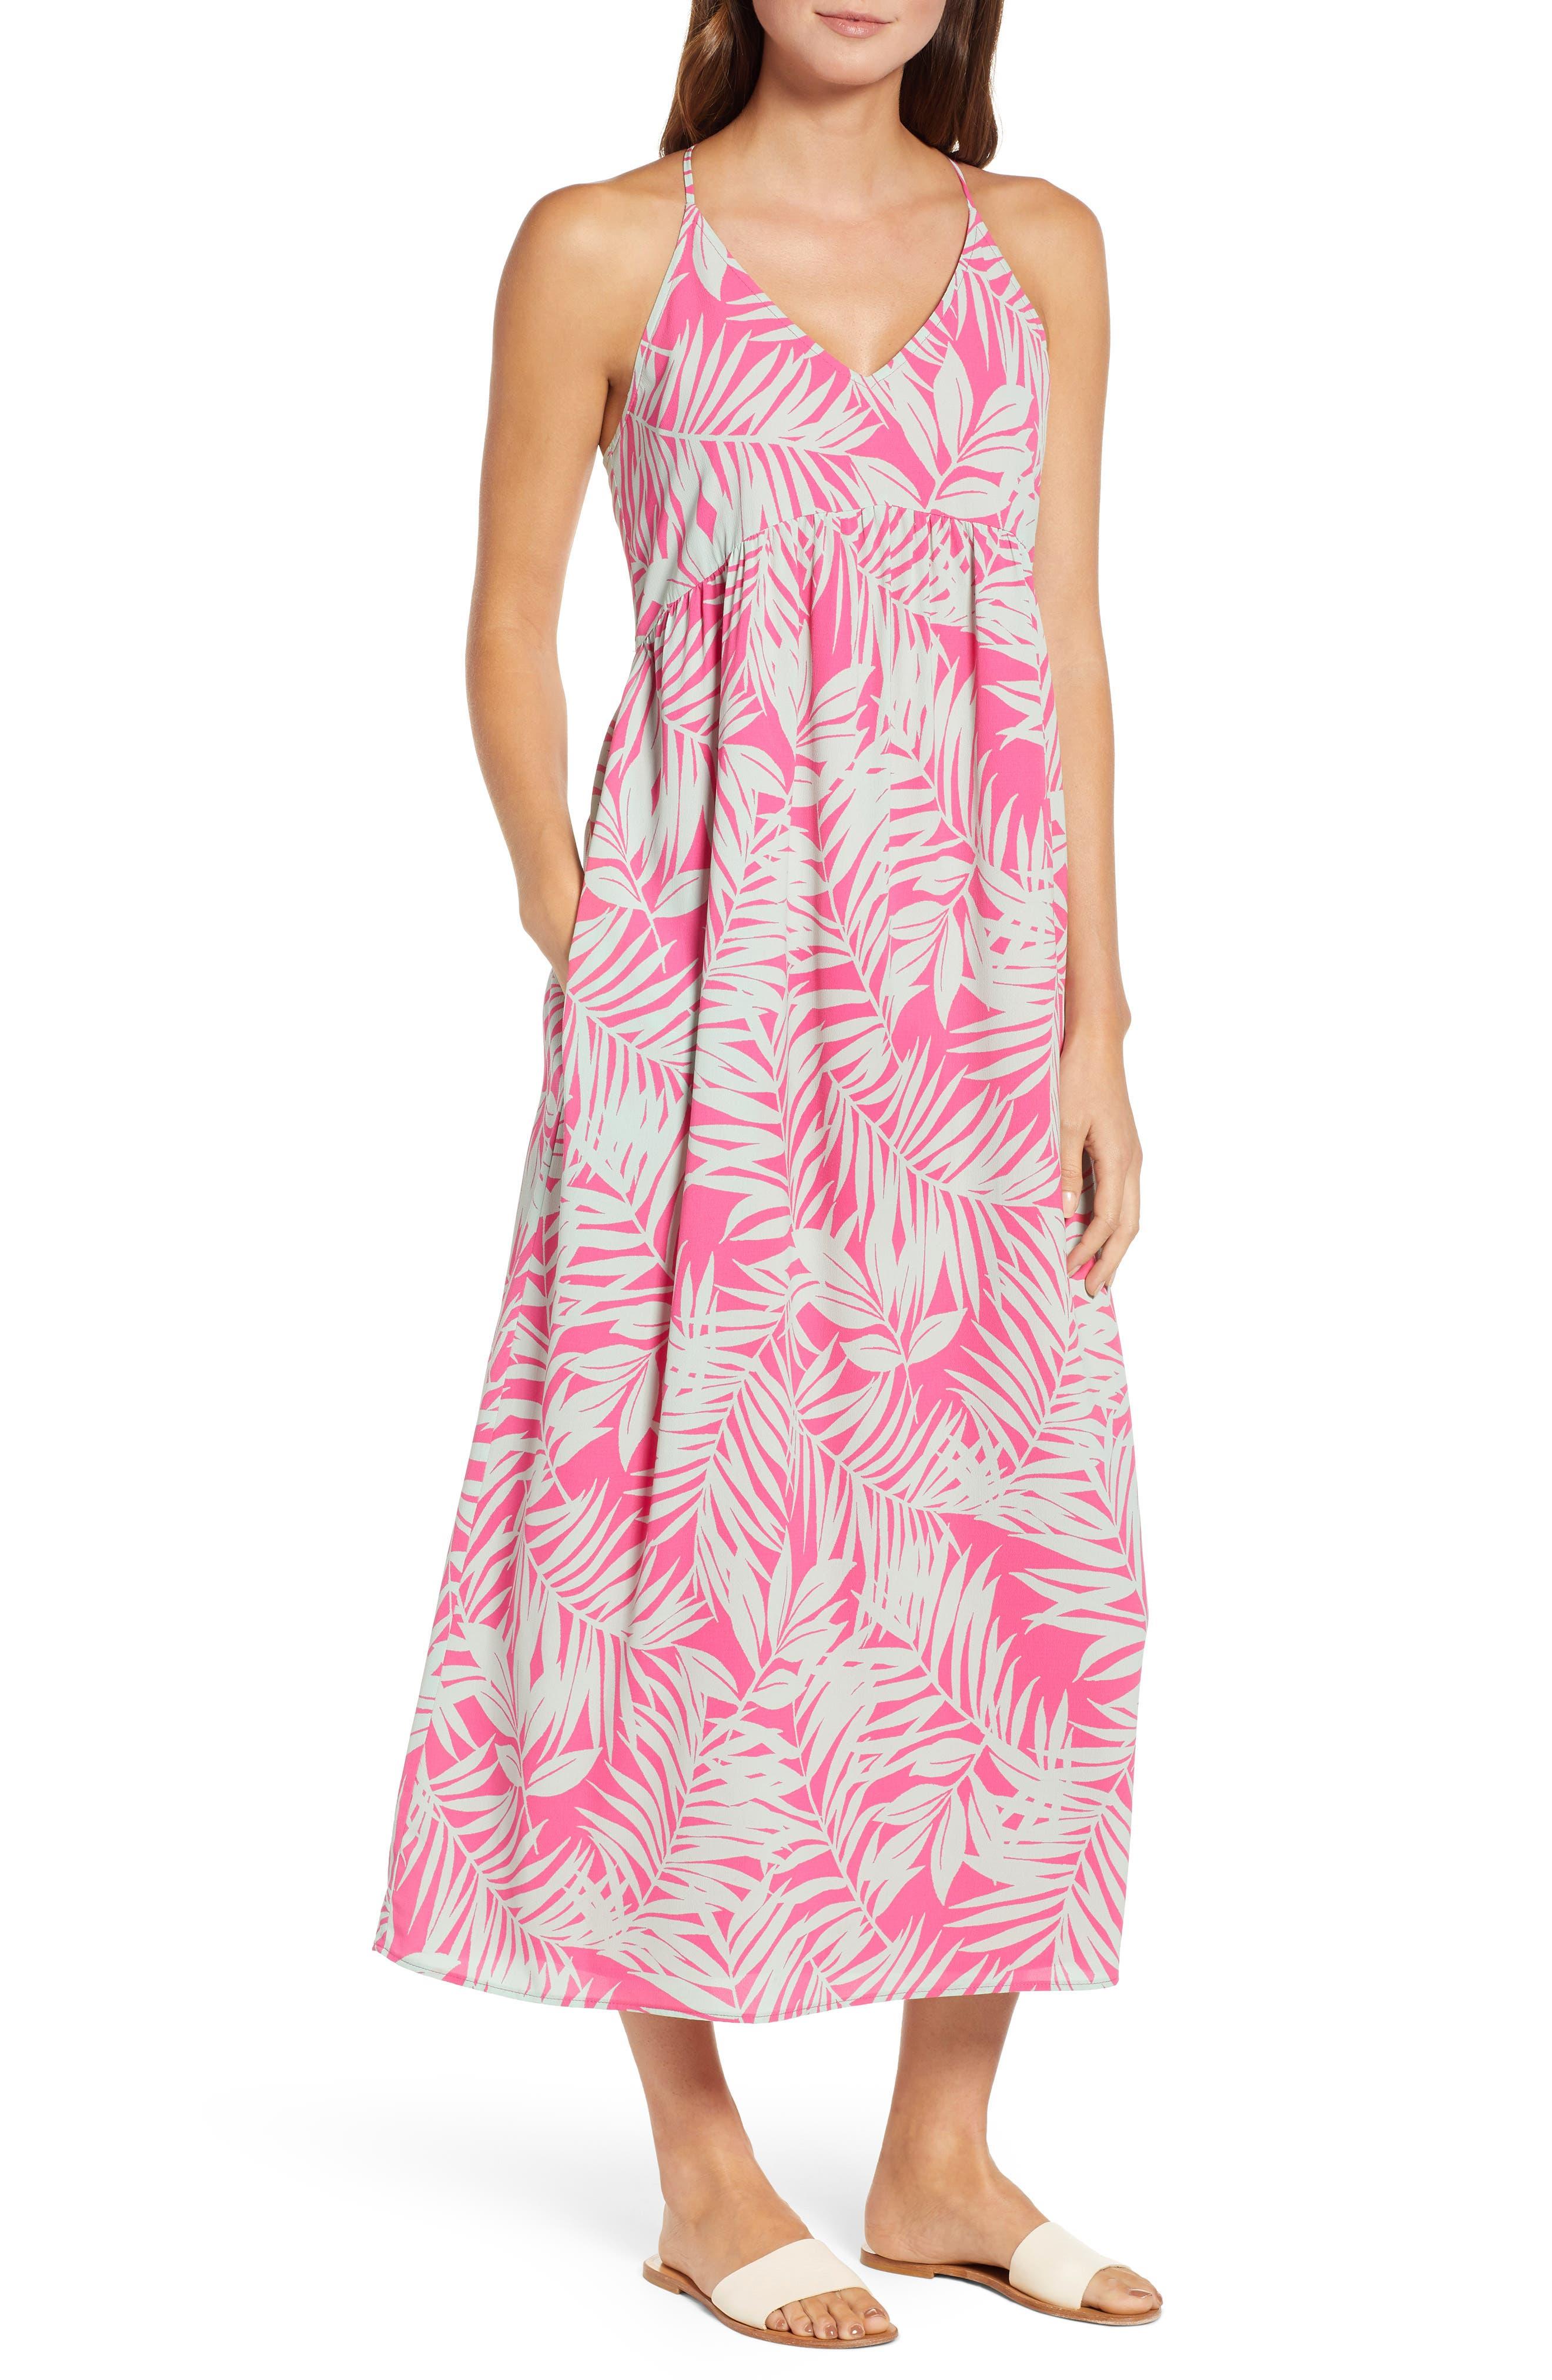 Gibson X Hi Sugarplum! Palm Springs Festival Maxi Dress, Pink (Regular & Petite) (Nordstrom Exclusive)